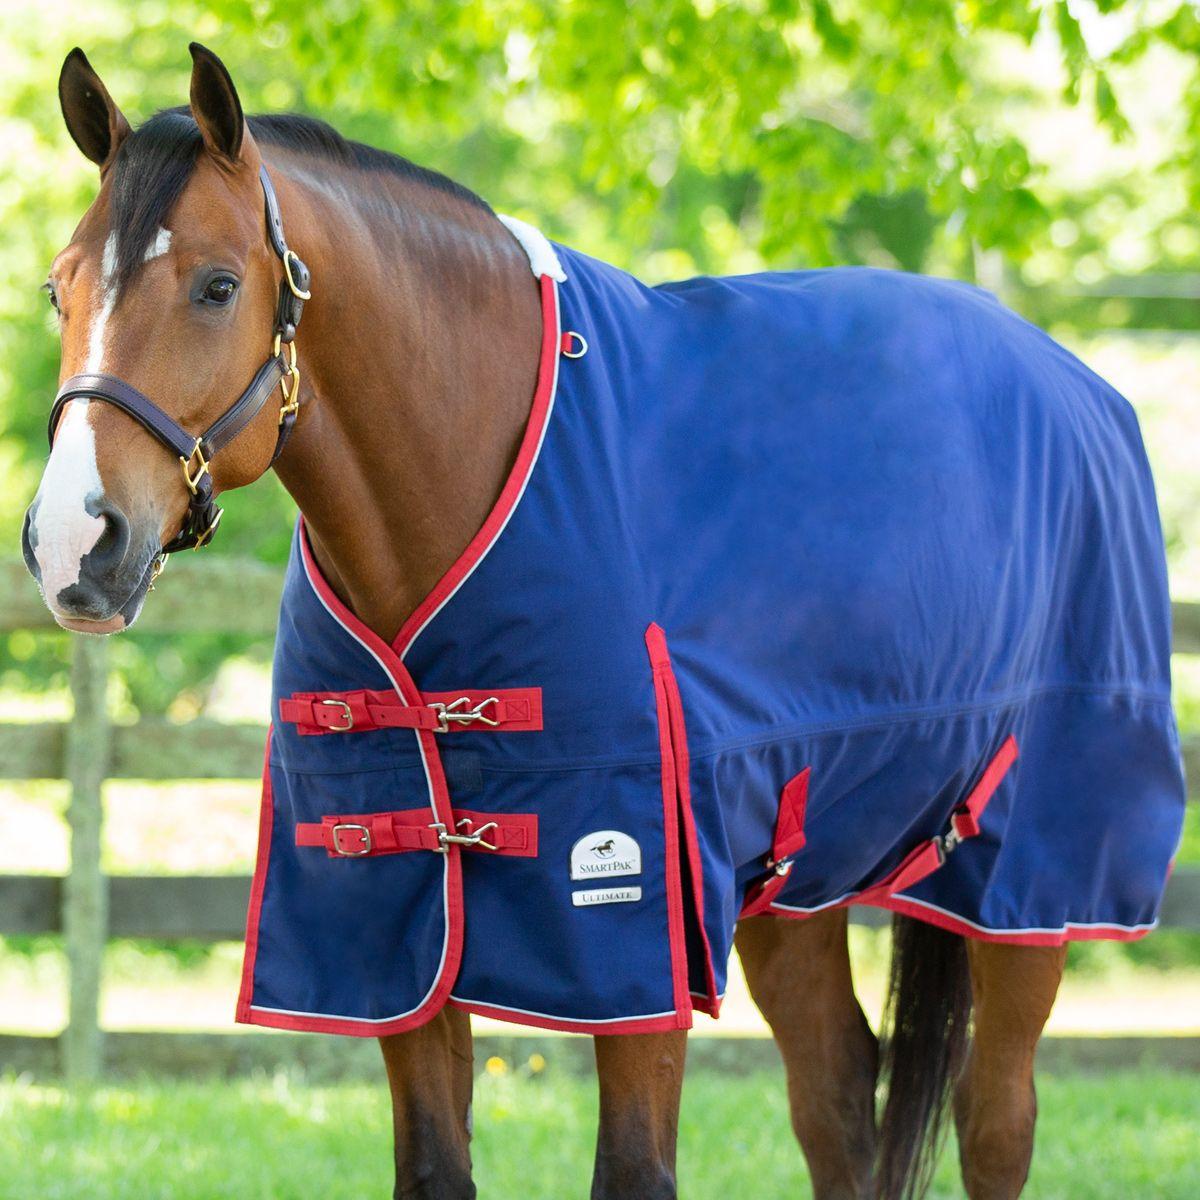 Smartpak Ultimate Turnout Blanket With Images Smartpak Waterproof Blanket Horse Gear